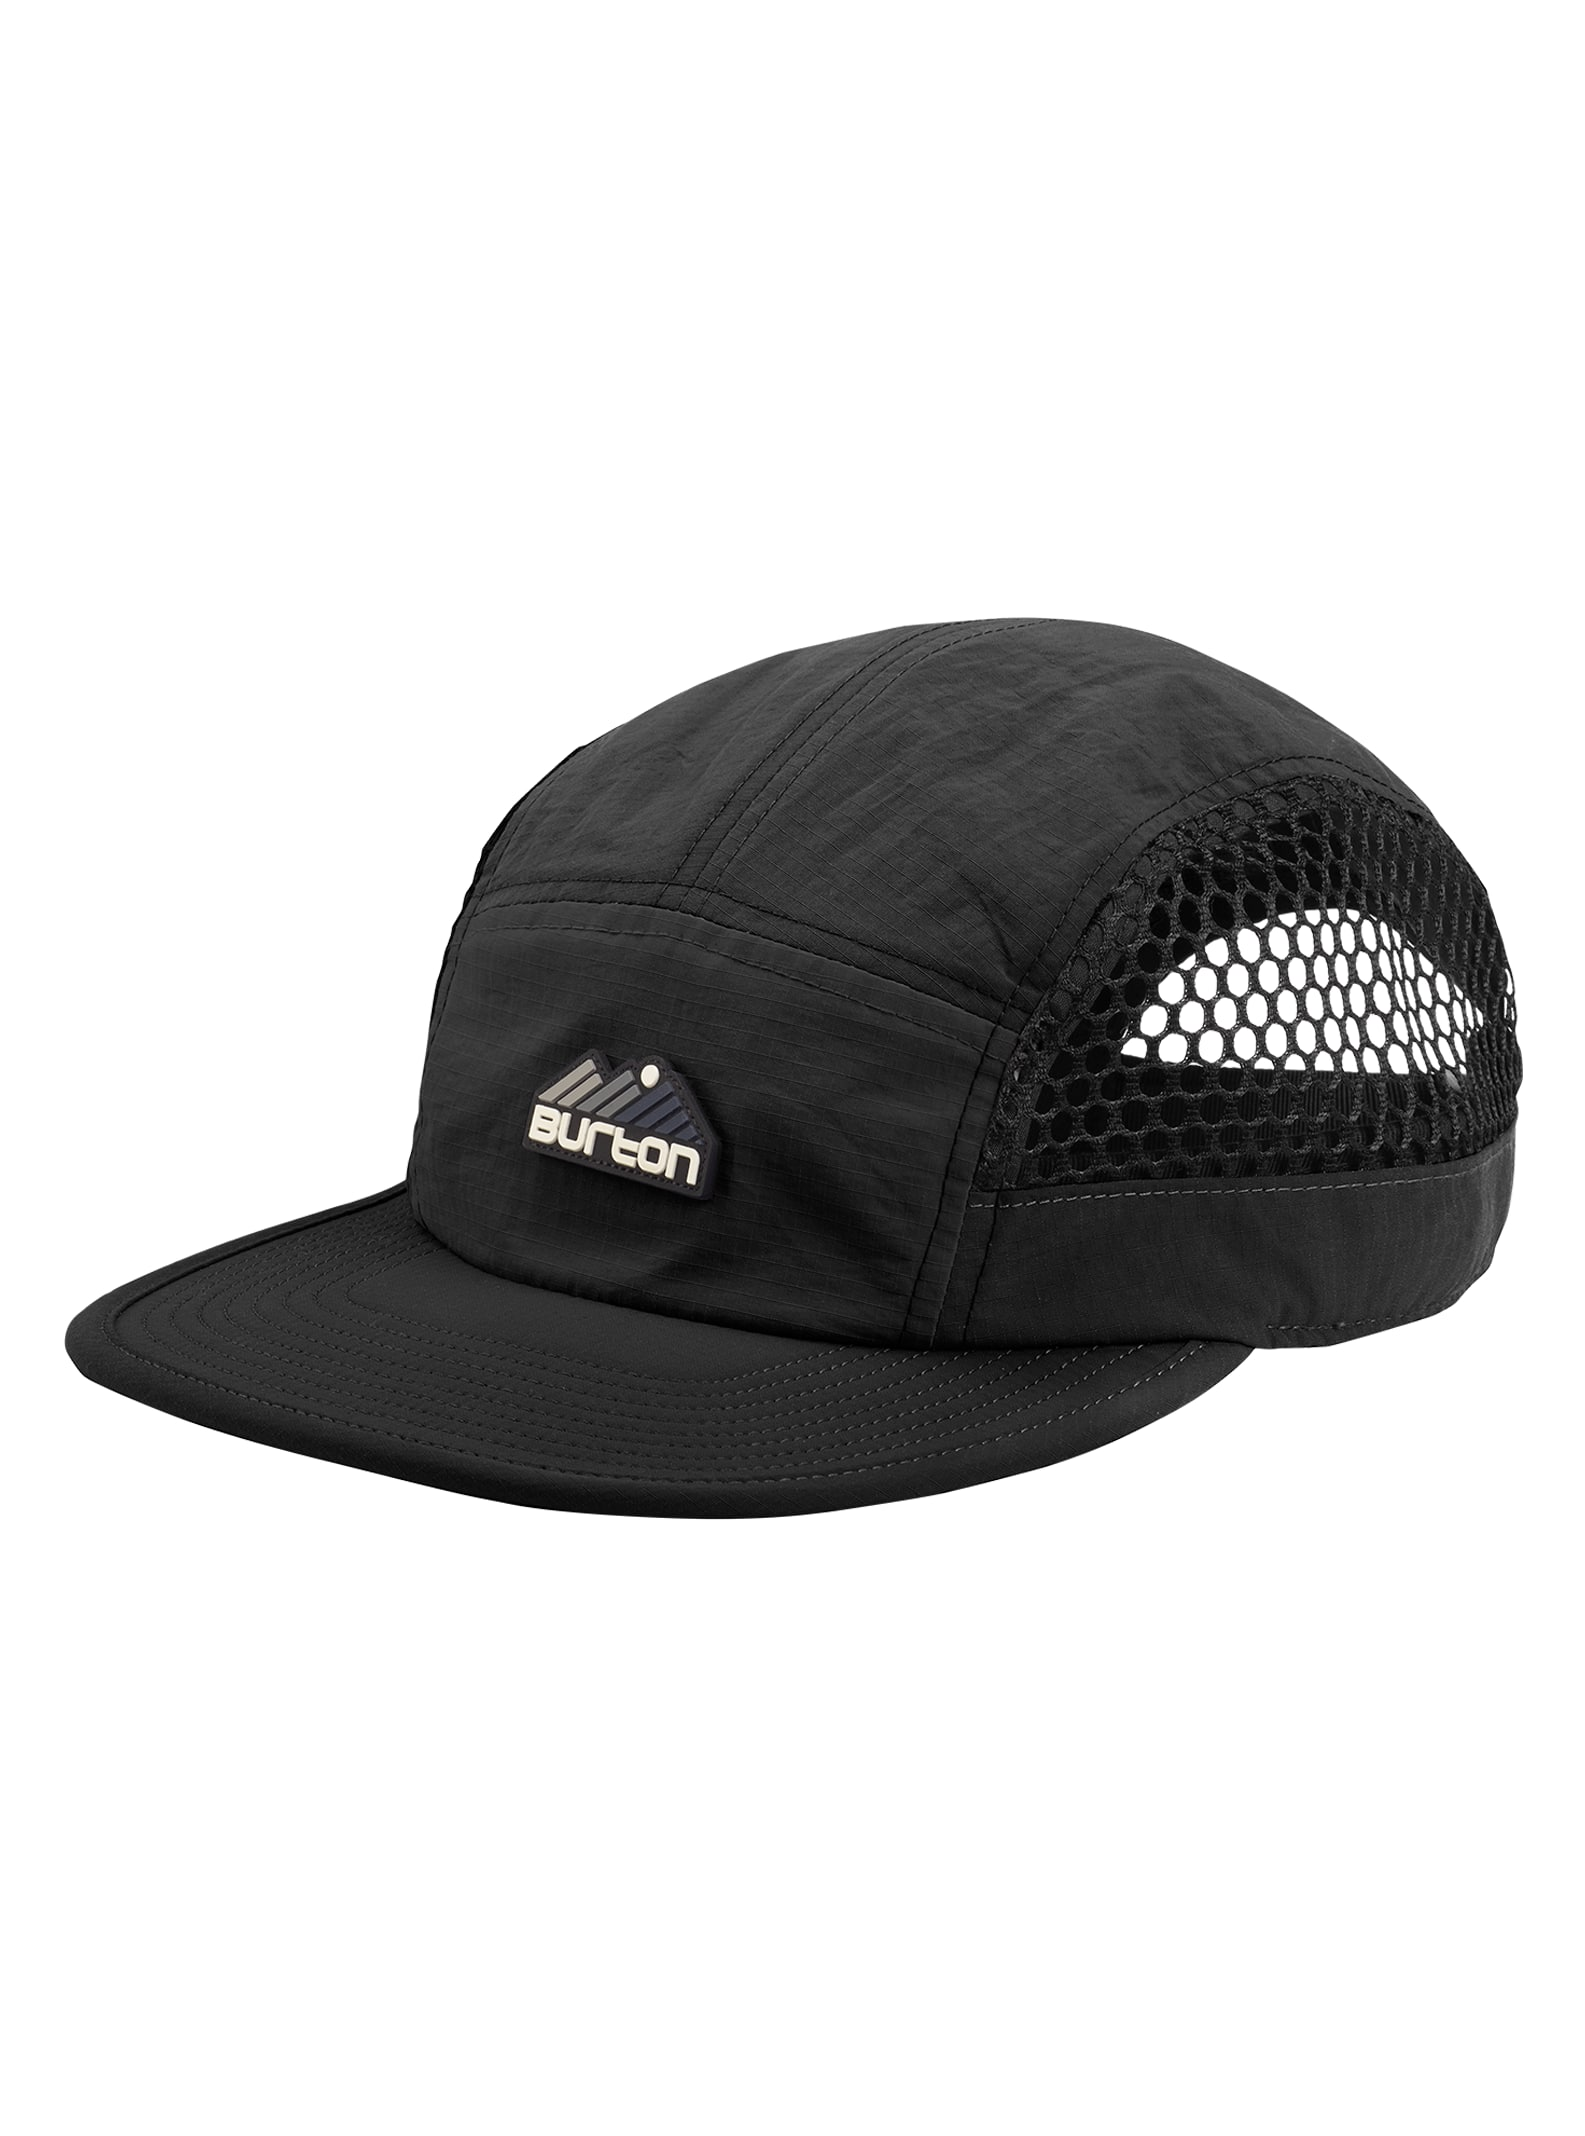 228247fca1f Men s Hats   Beanies